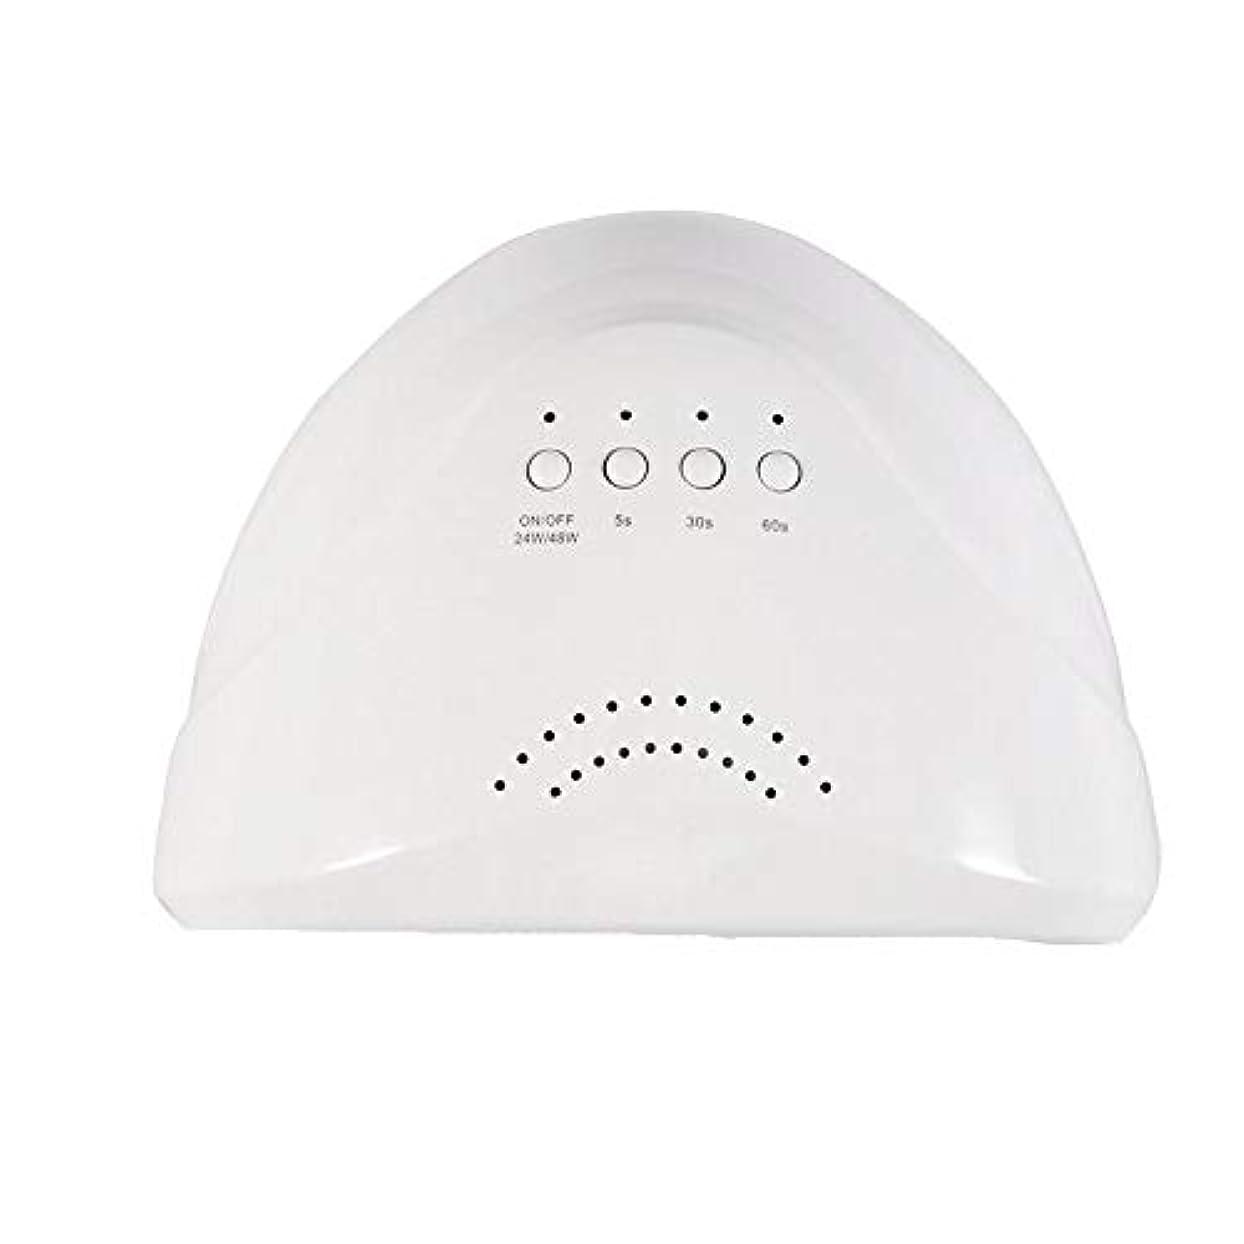 YESONEEP ネイルランプドライヤー太陽光療法機UV Led光線療法ランプ48ワット誘導ネイルランプライトマニキュアツール (Size : 48W)